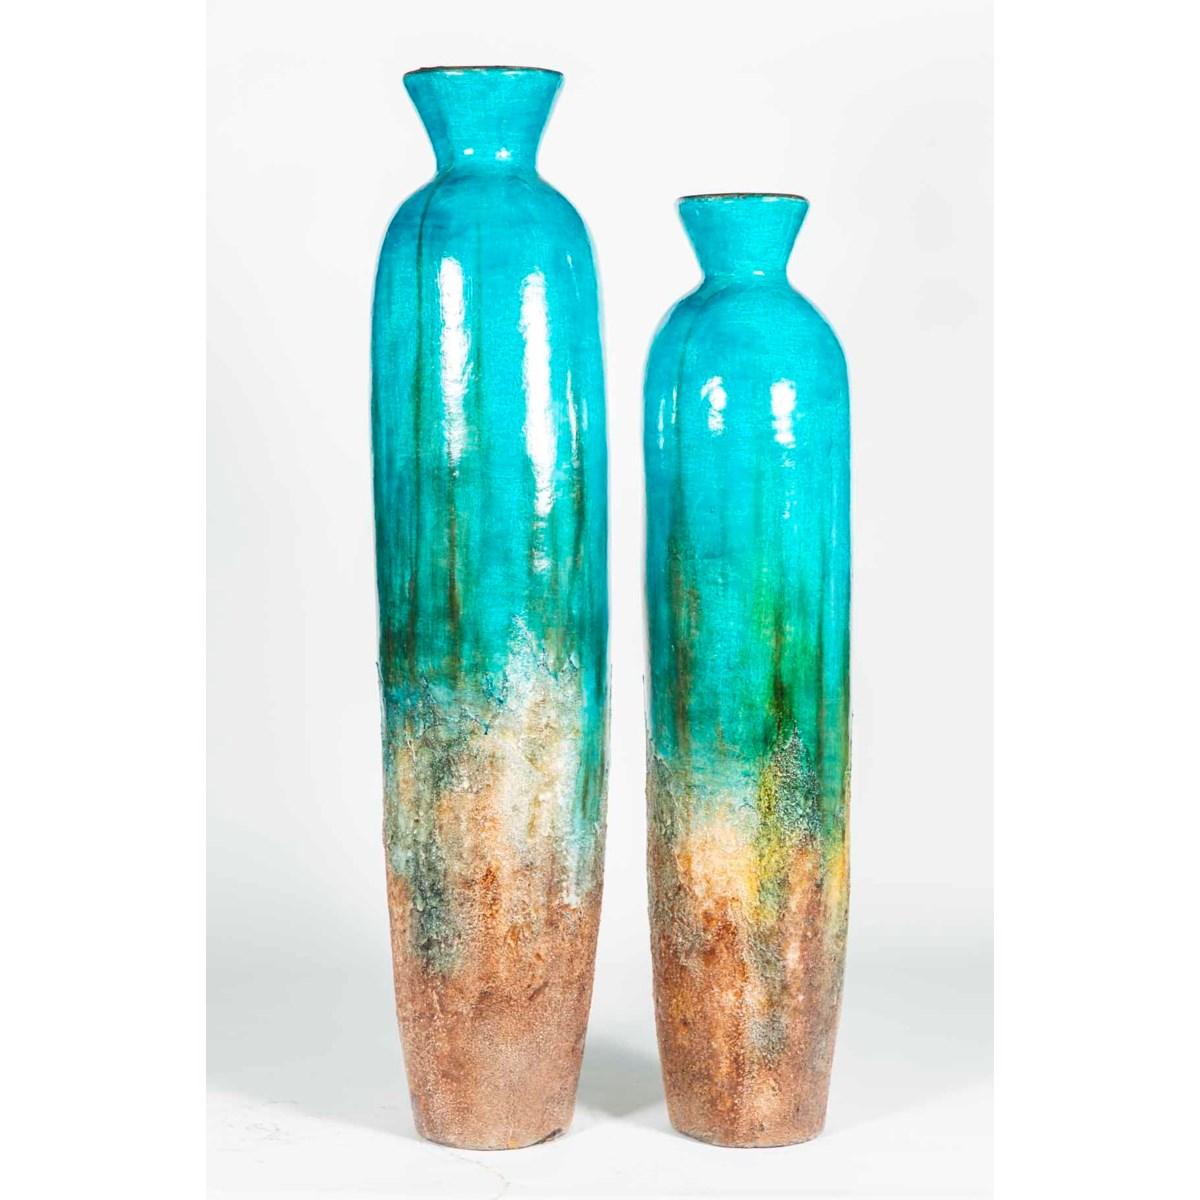 Set of 2 Floor Vases in Atlantic Coral Finish